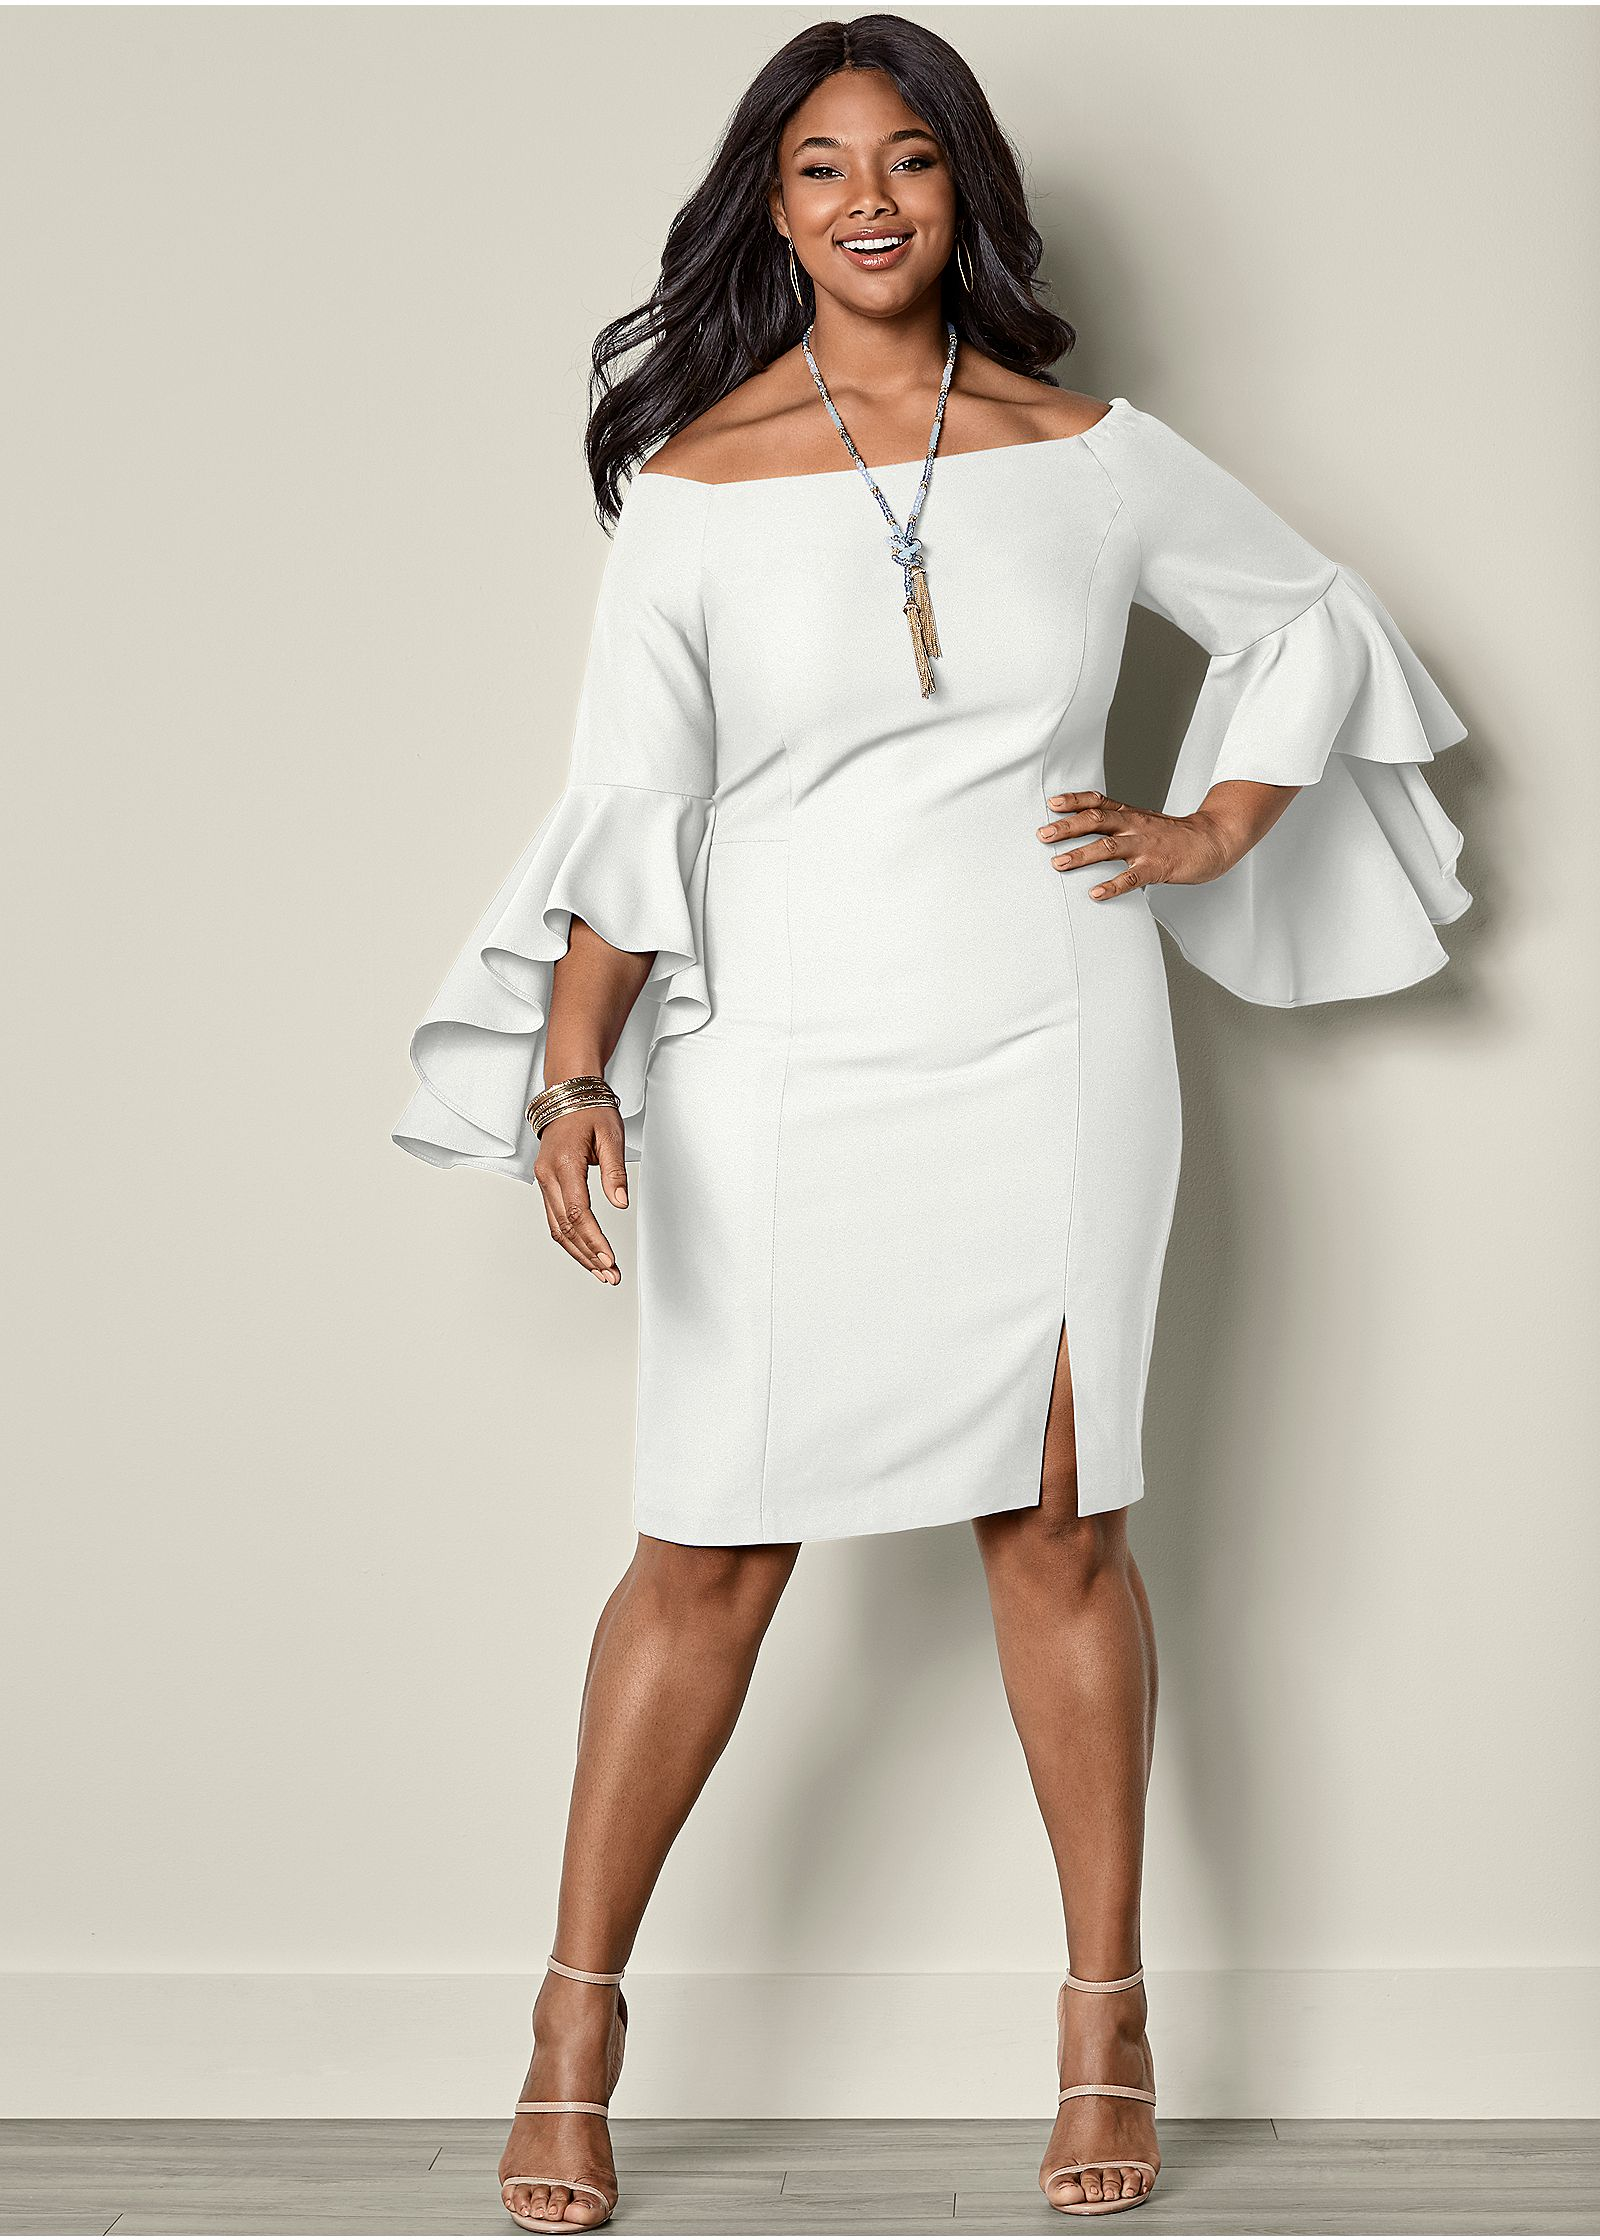 Plus Size Corporate Dresses